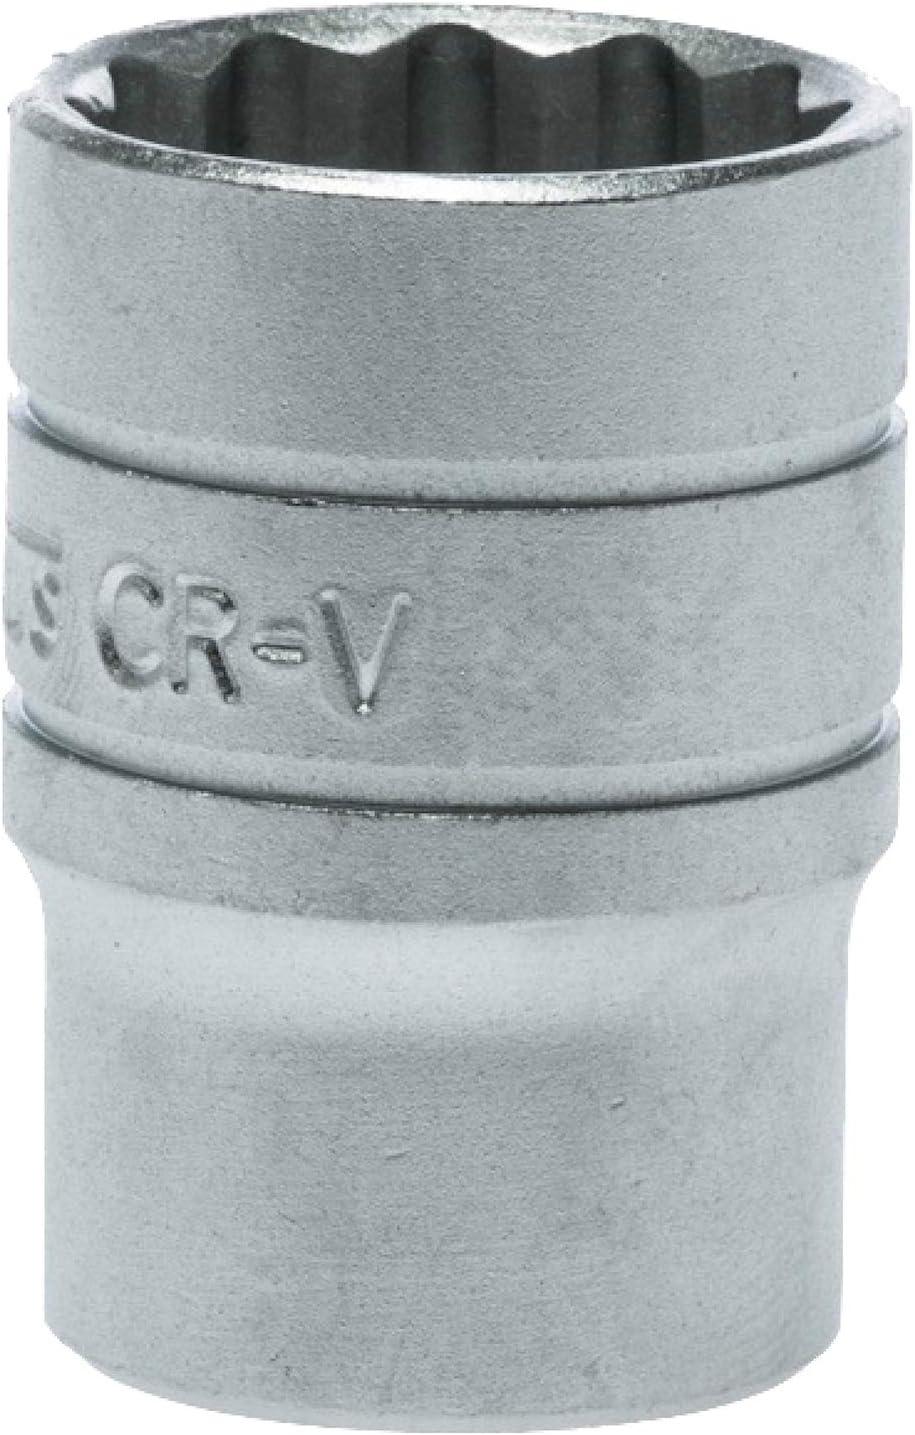 Teng Tools 21mm 1//2 Inch Drive 12 Point Regular//Shallow Metric Socket M120521-C